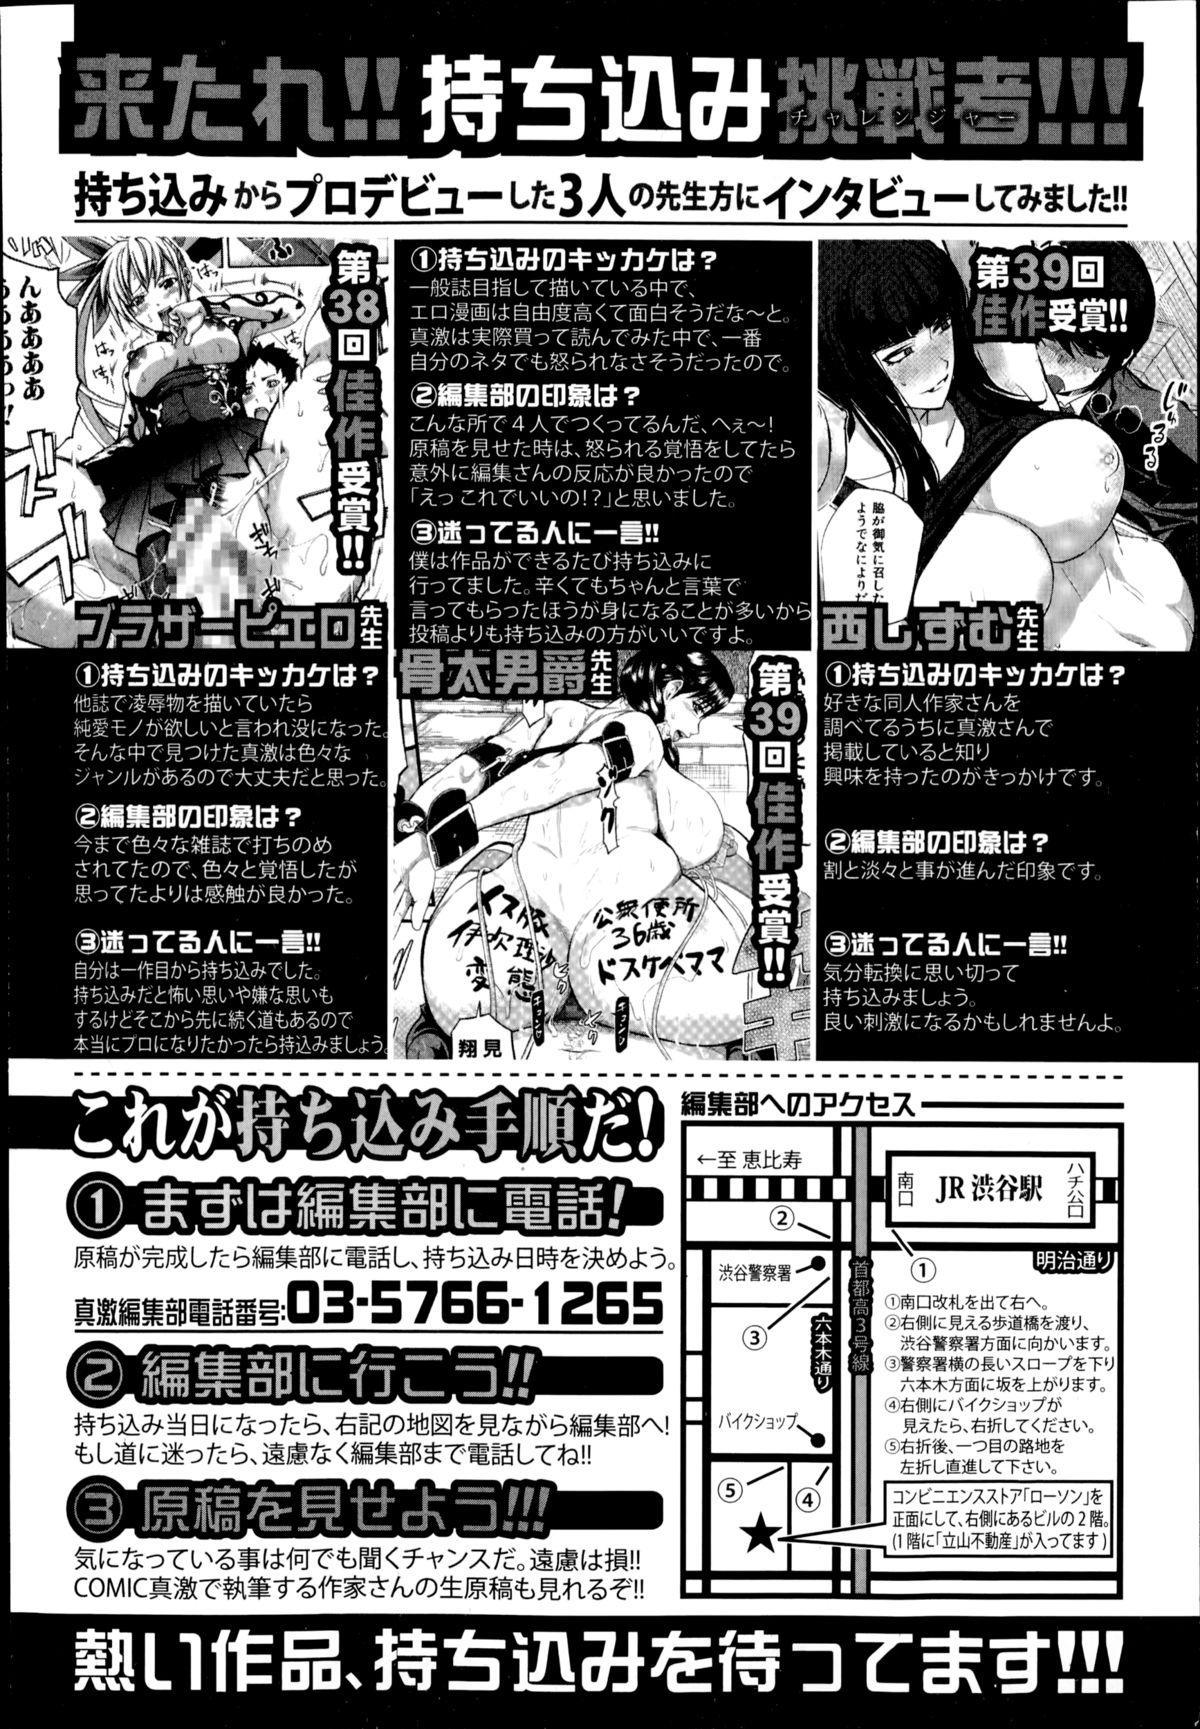 COMIC Shingeki 2014-12 345